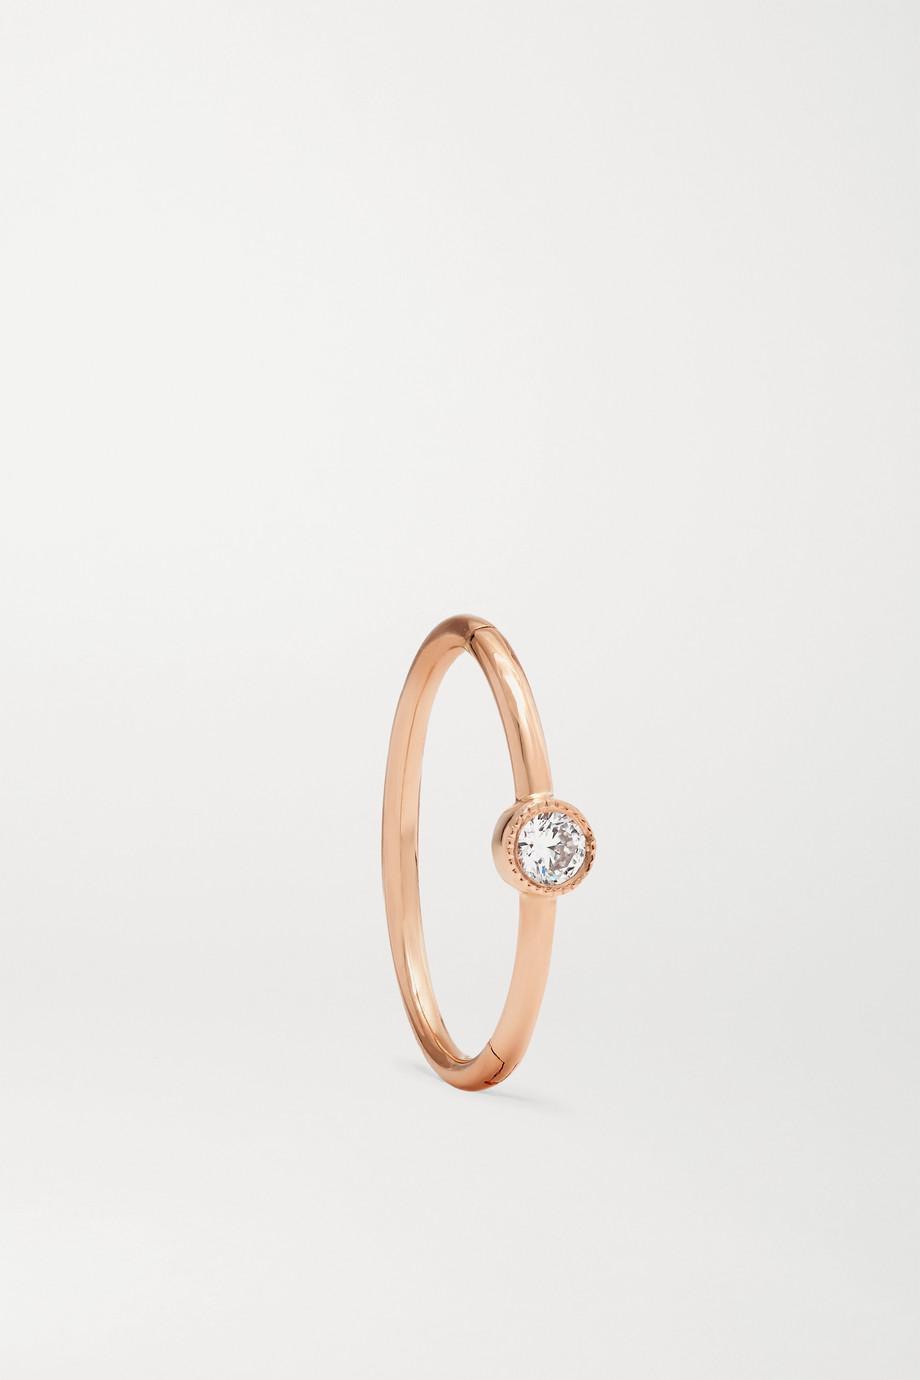 Maria Tash 11mm 18-karat rose gold diamond hoop earring